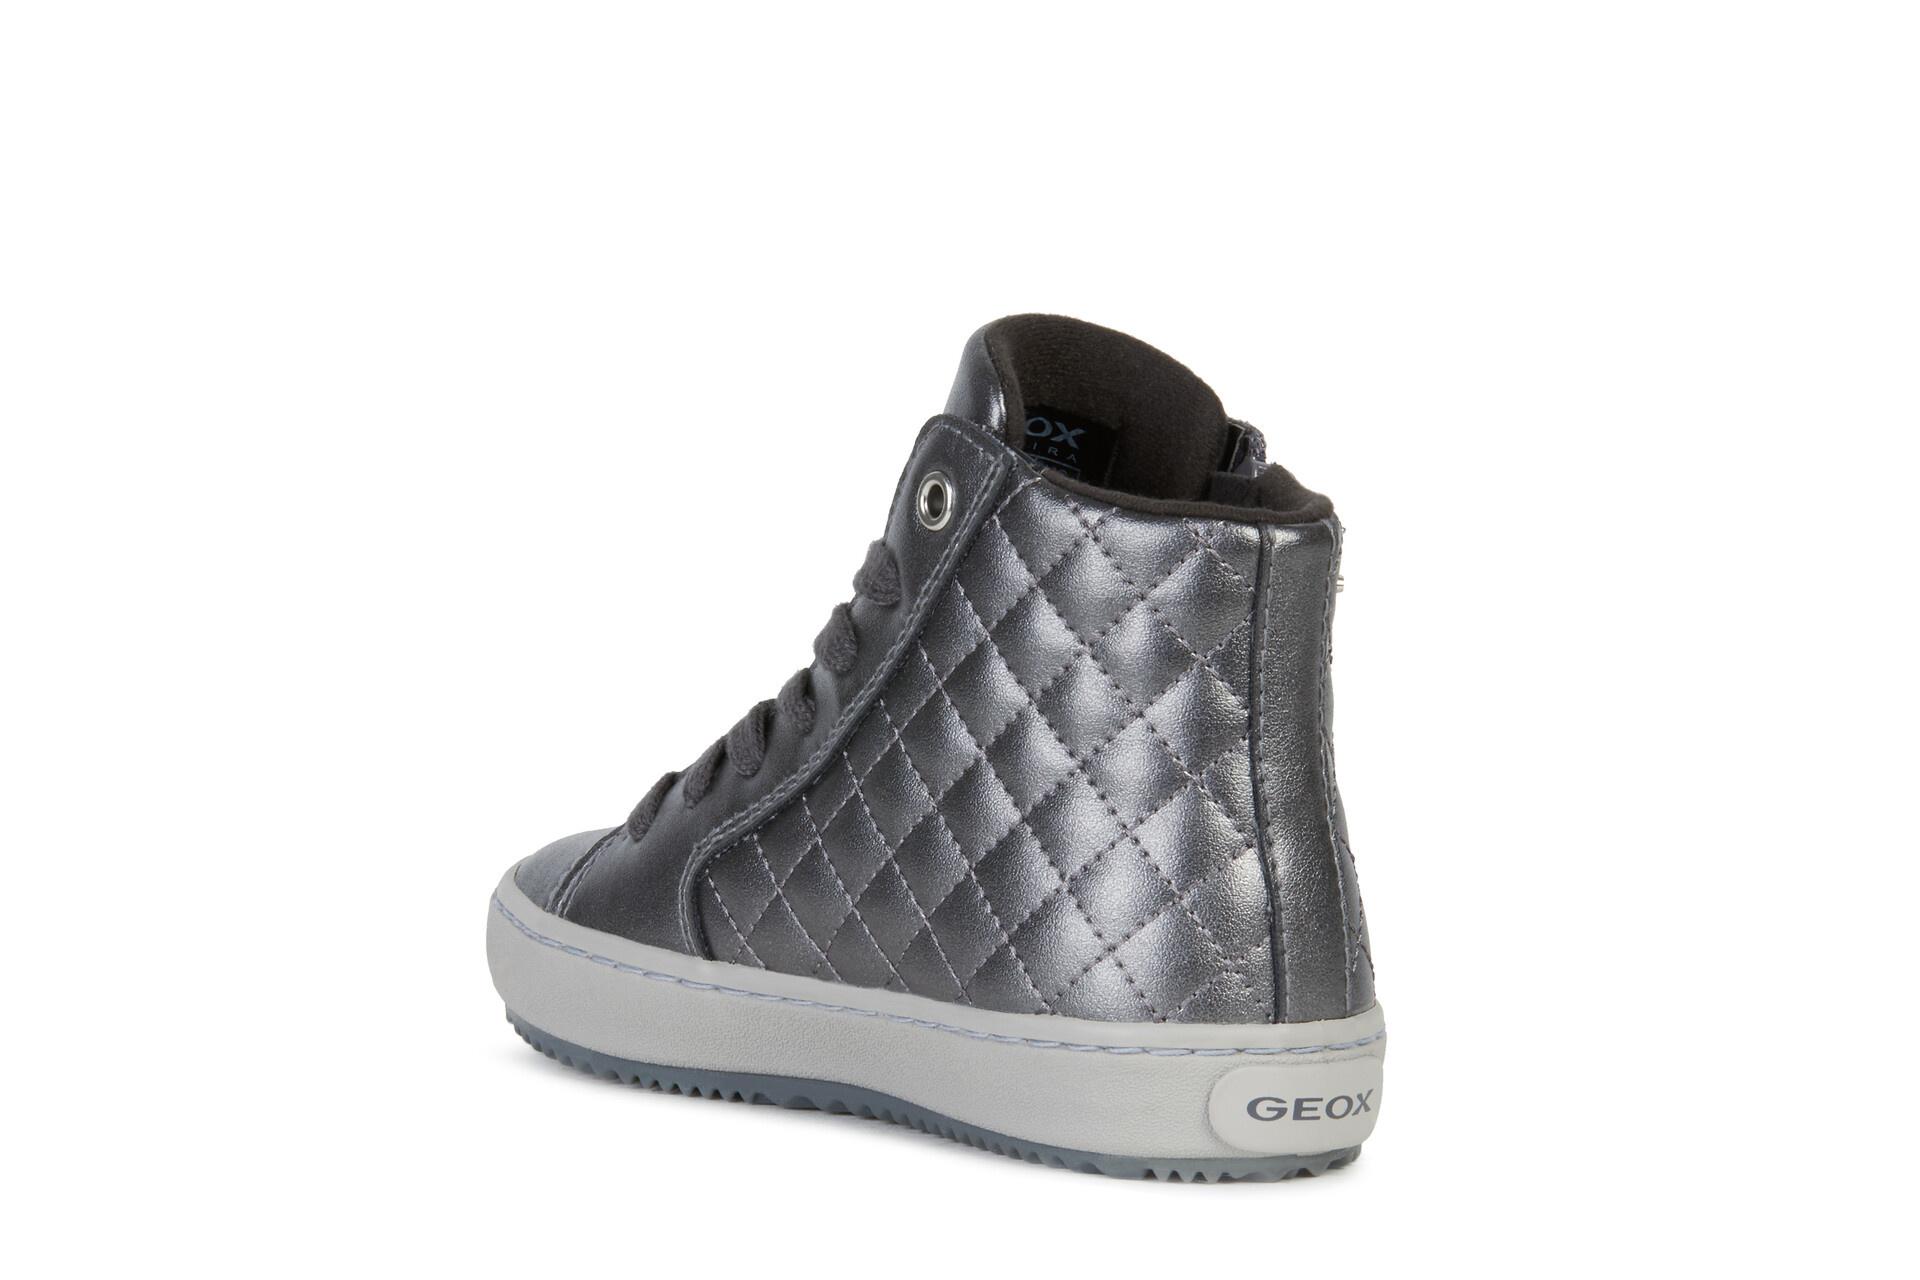 Geox Kalispera DK Grey